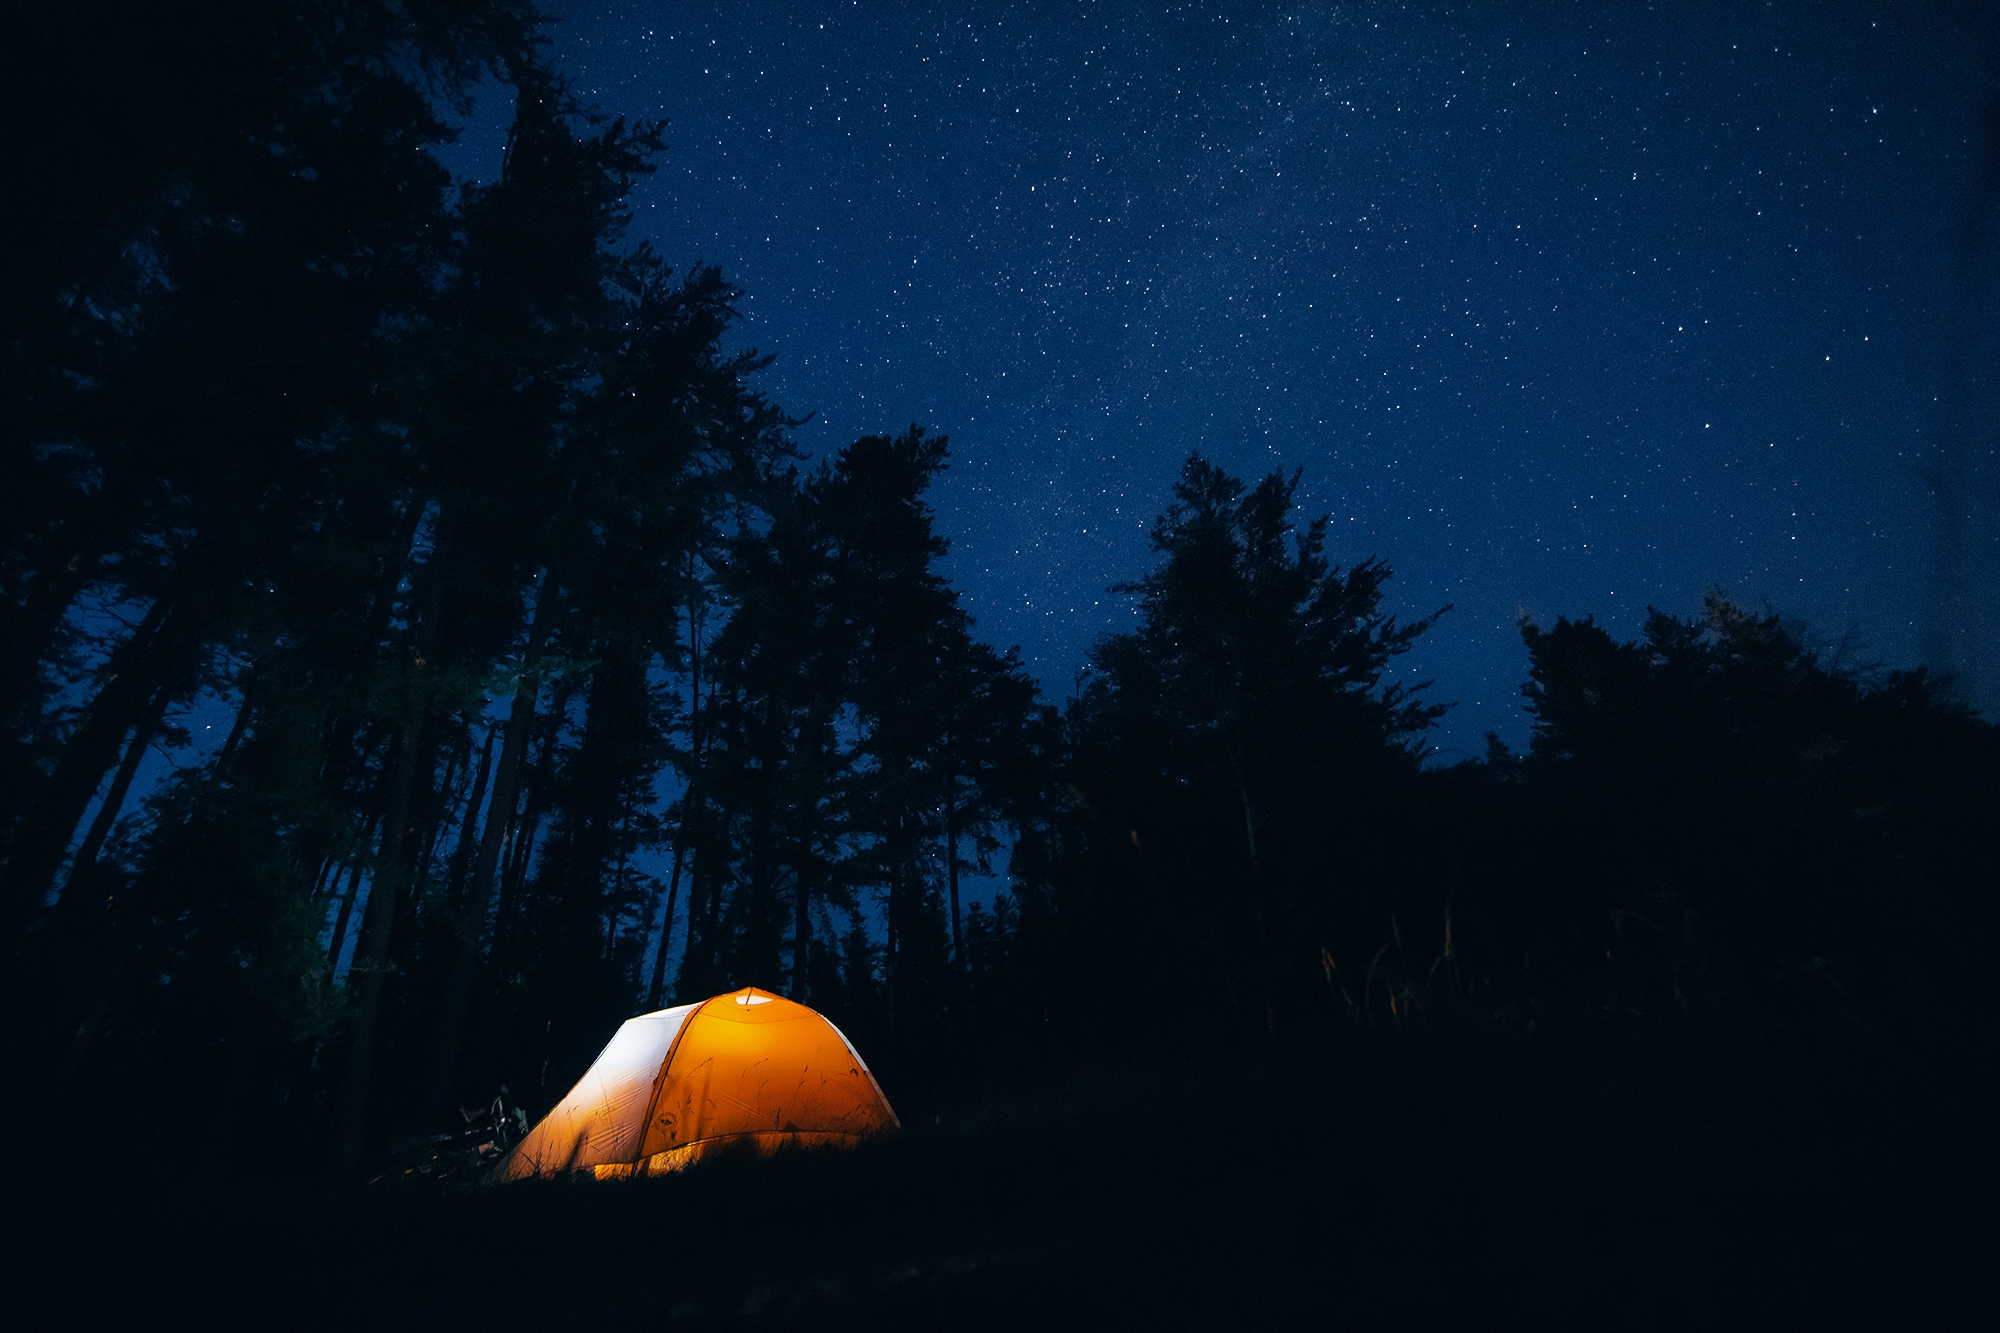 meaning night photography tent  - jonathonreed | ello